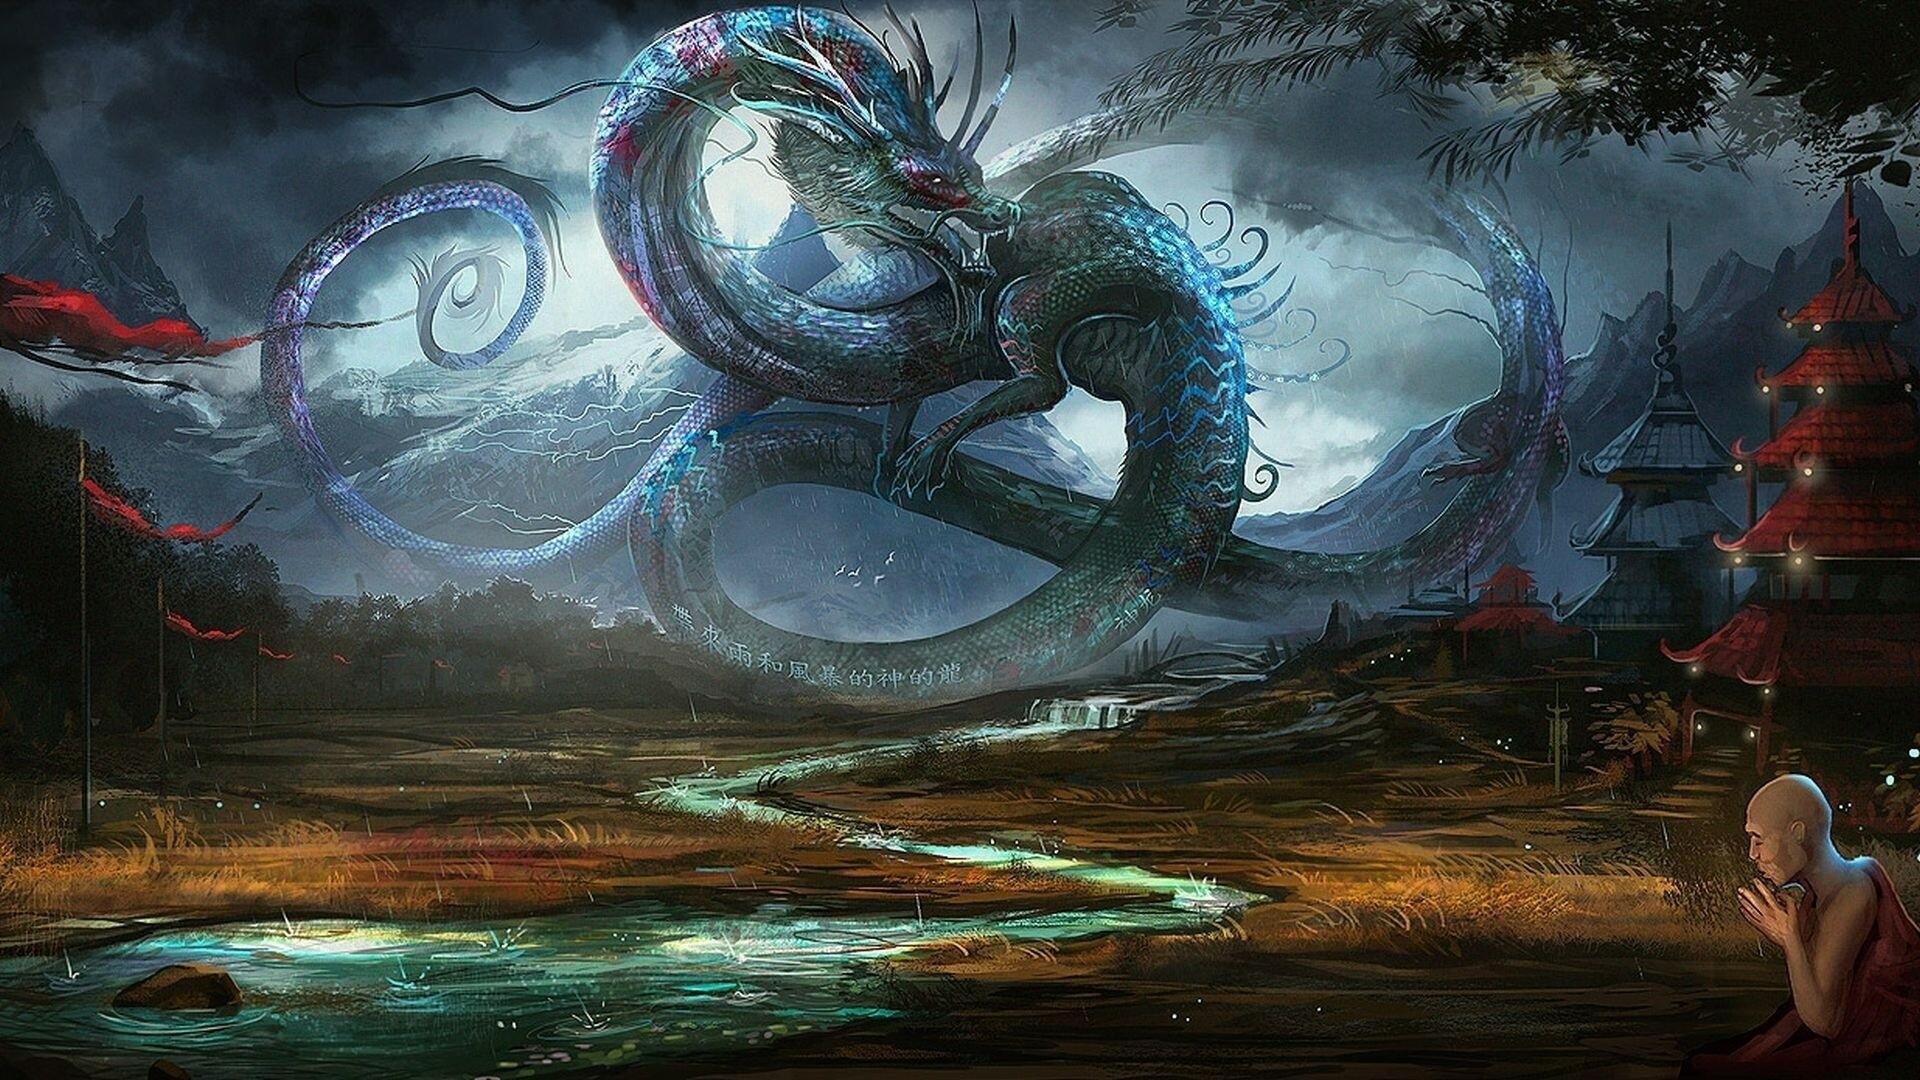 Sejarah Naga Sejak Awal Dikenal di Dunia, Apakah Benar Cuma Mitos?